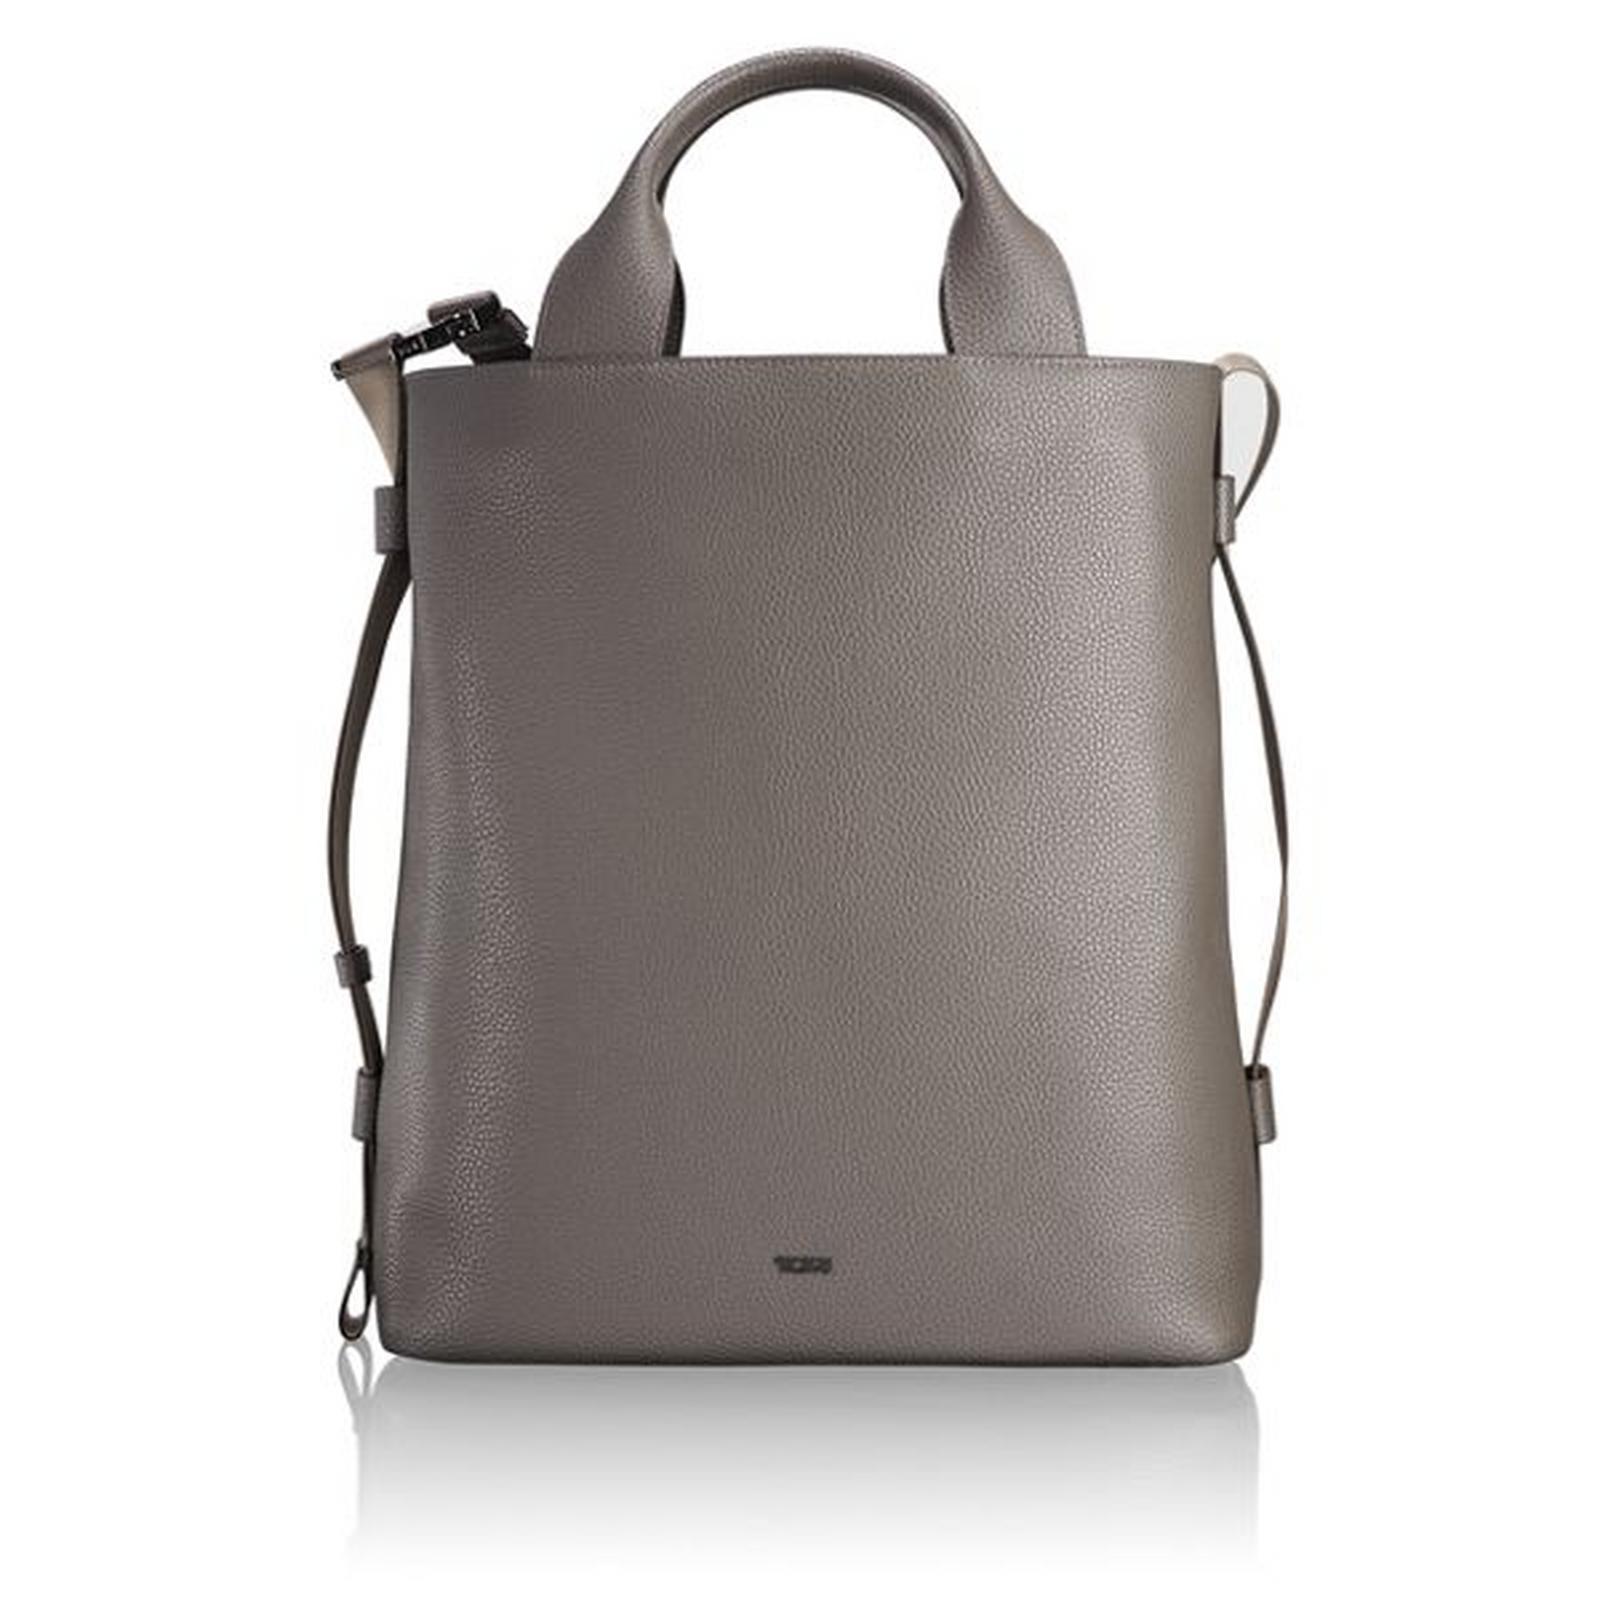 b2e3350a8d Samsonite 88u 005 Guardit Laptop Backpack M 15 16